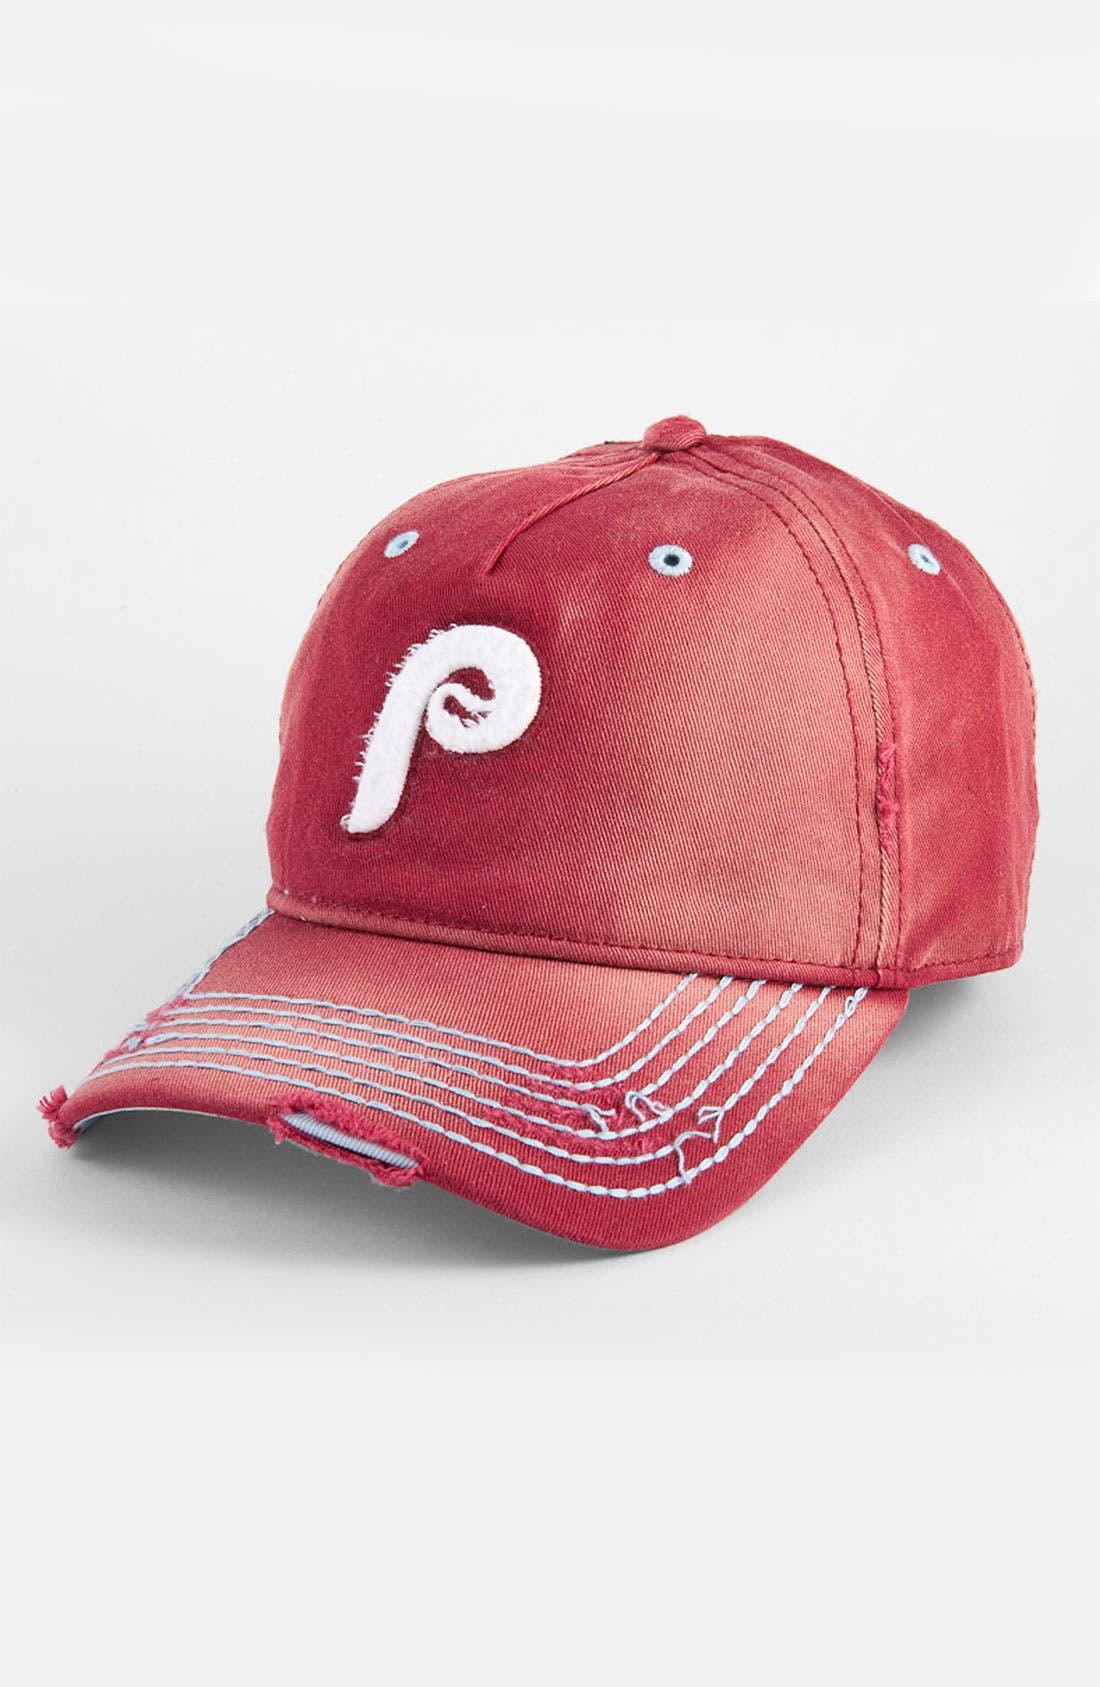 Main Image - American Needle 'Phillies' Baseball Cap